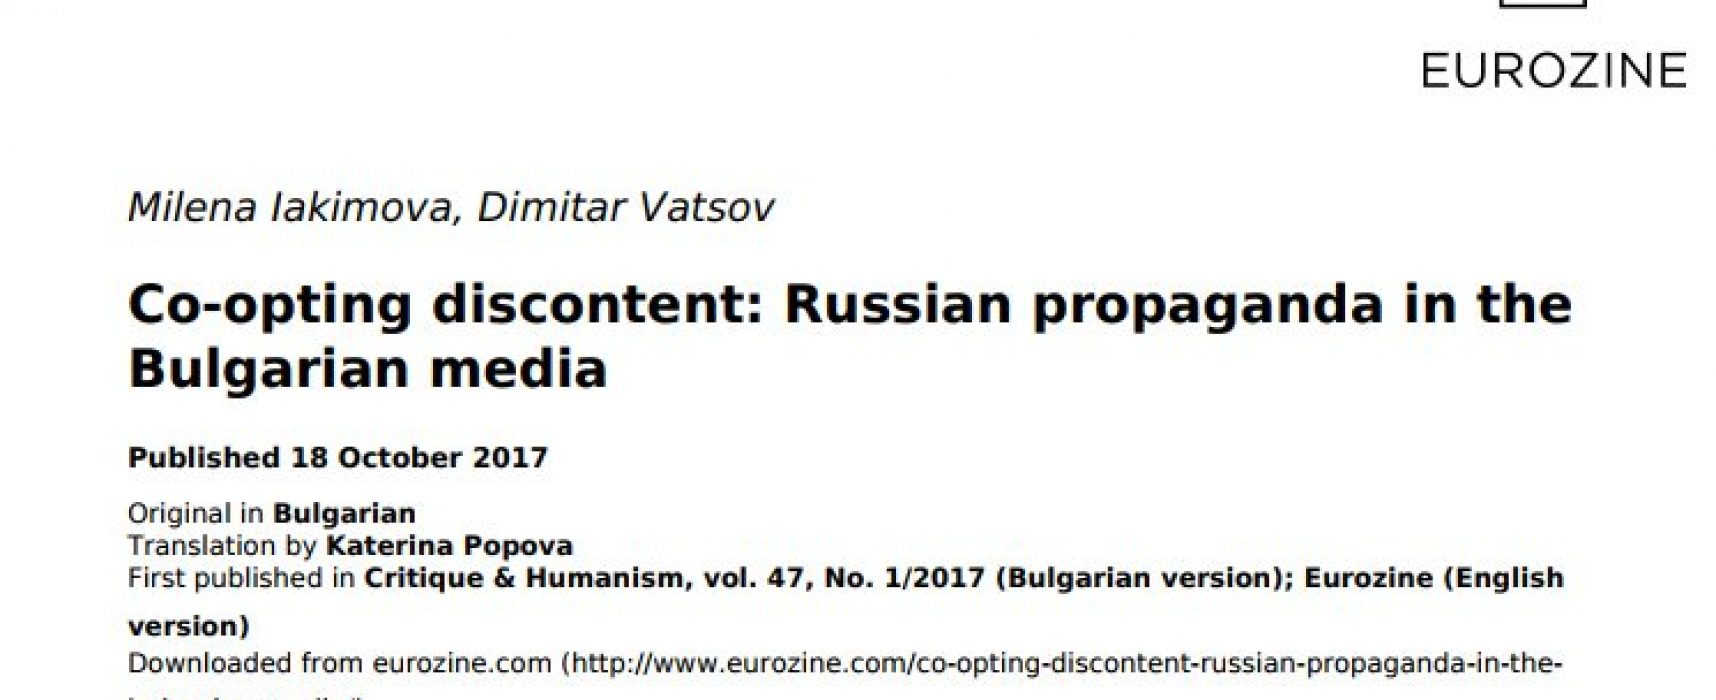 Co-opting discontent: Russian propaganda in the Bulgarian media